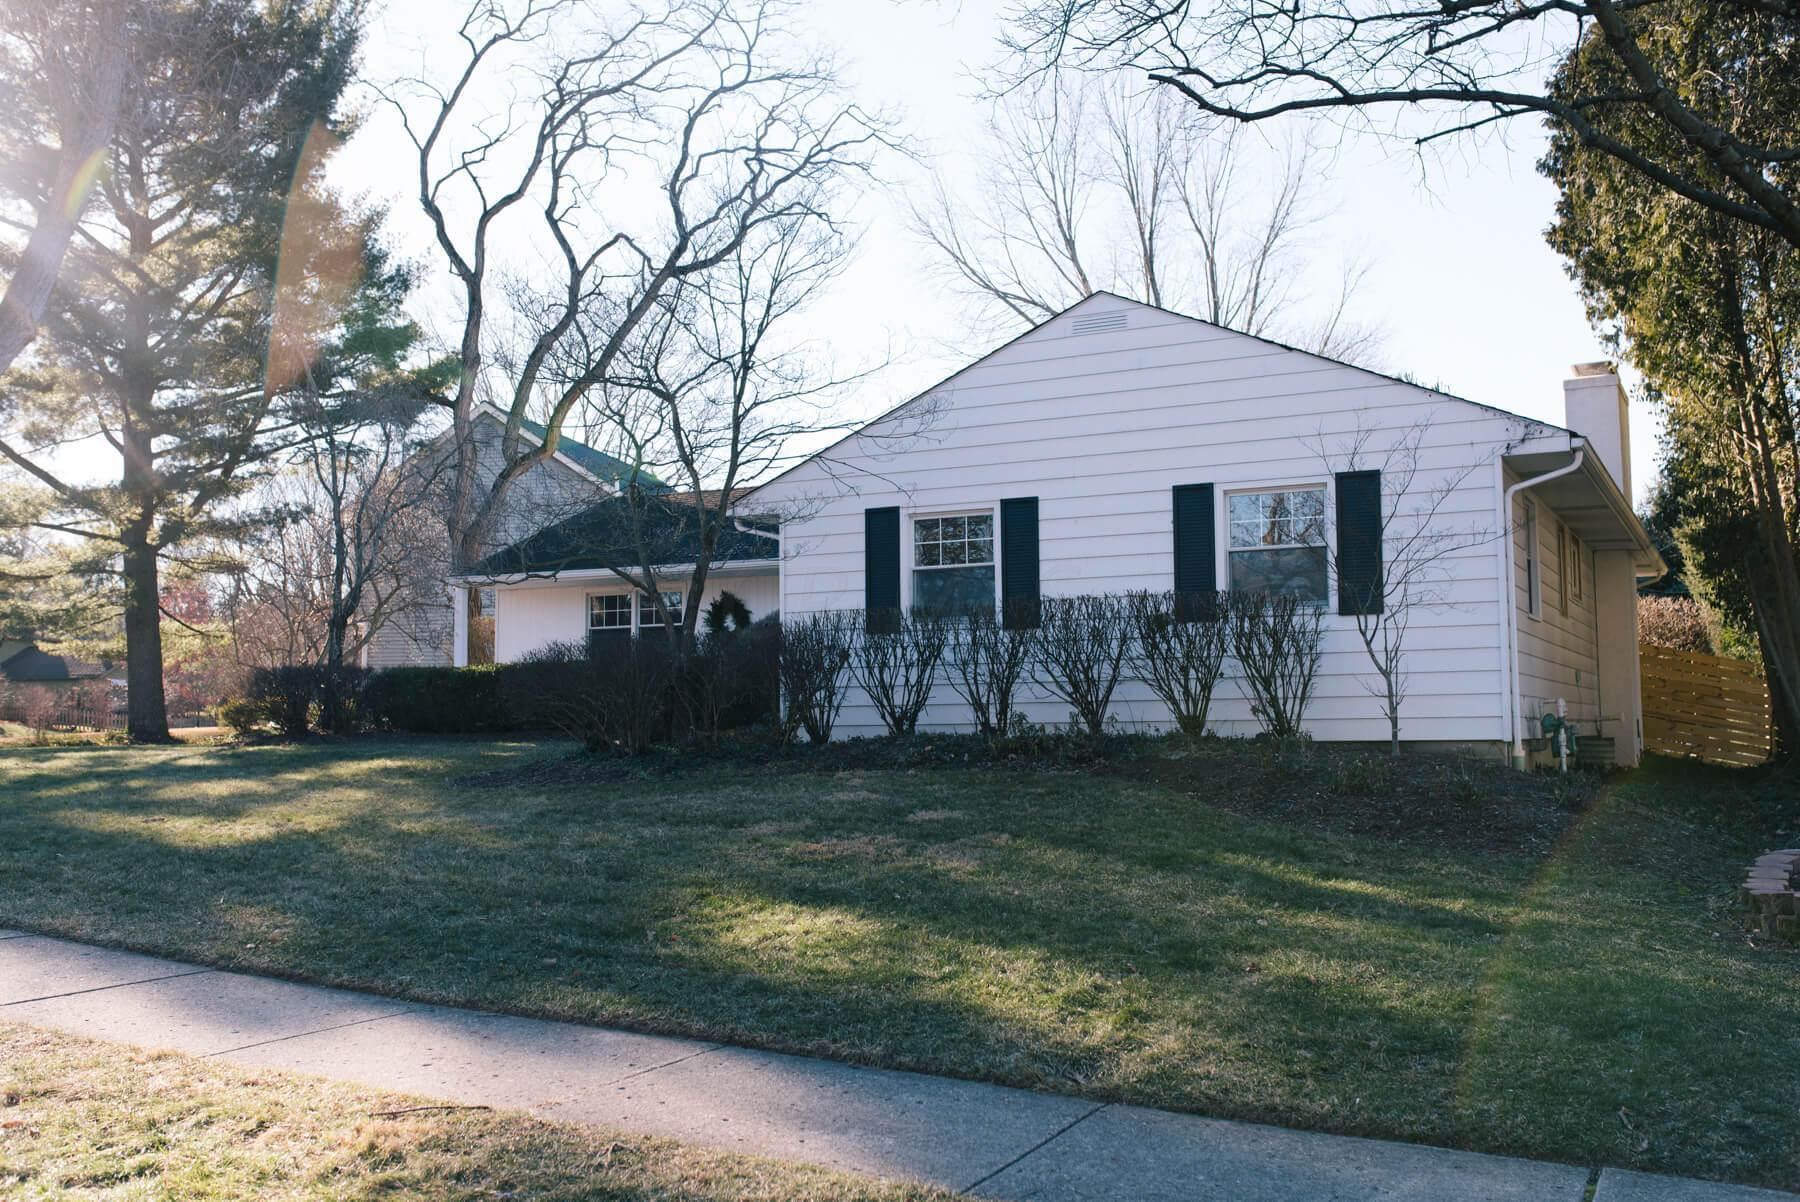 Photo of 179 Sinsbury Drive N, Worthington, OH 43085 (MLS # 221002376)